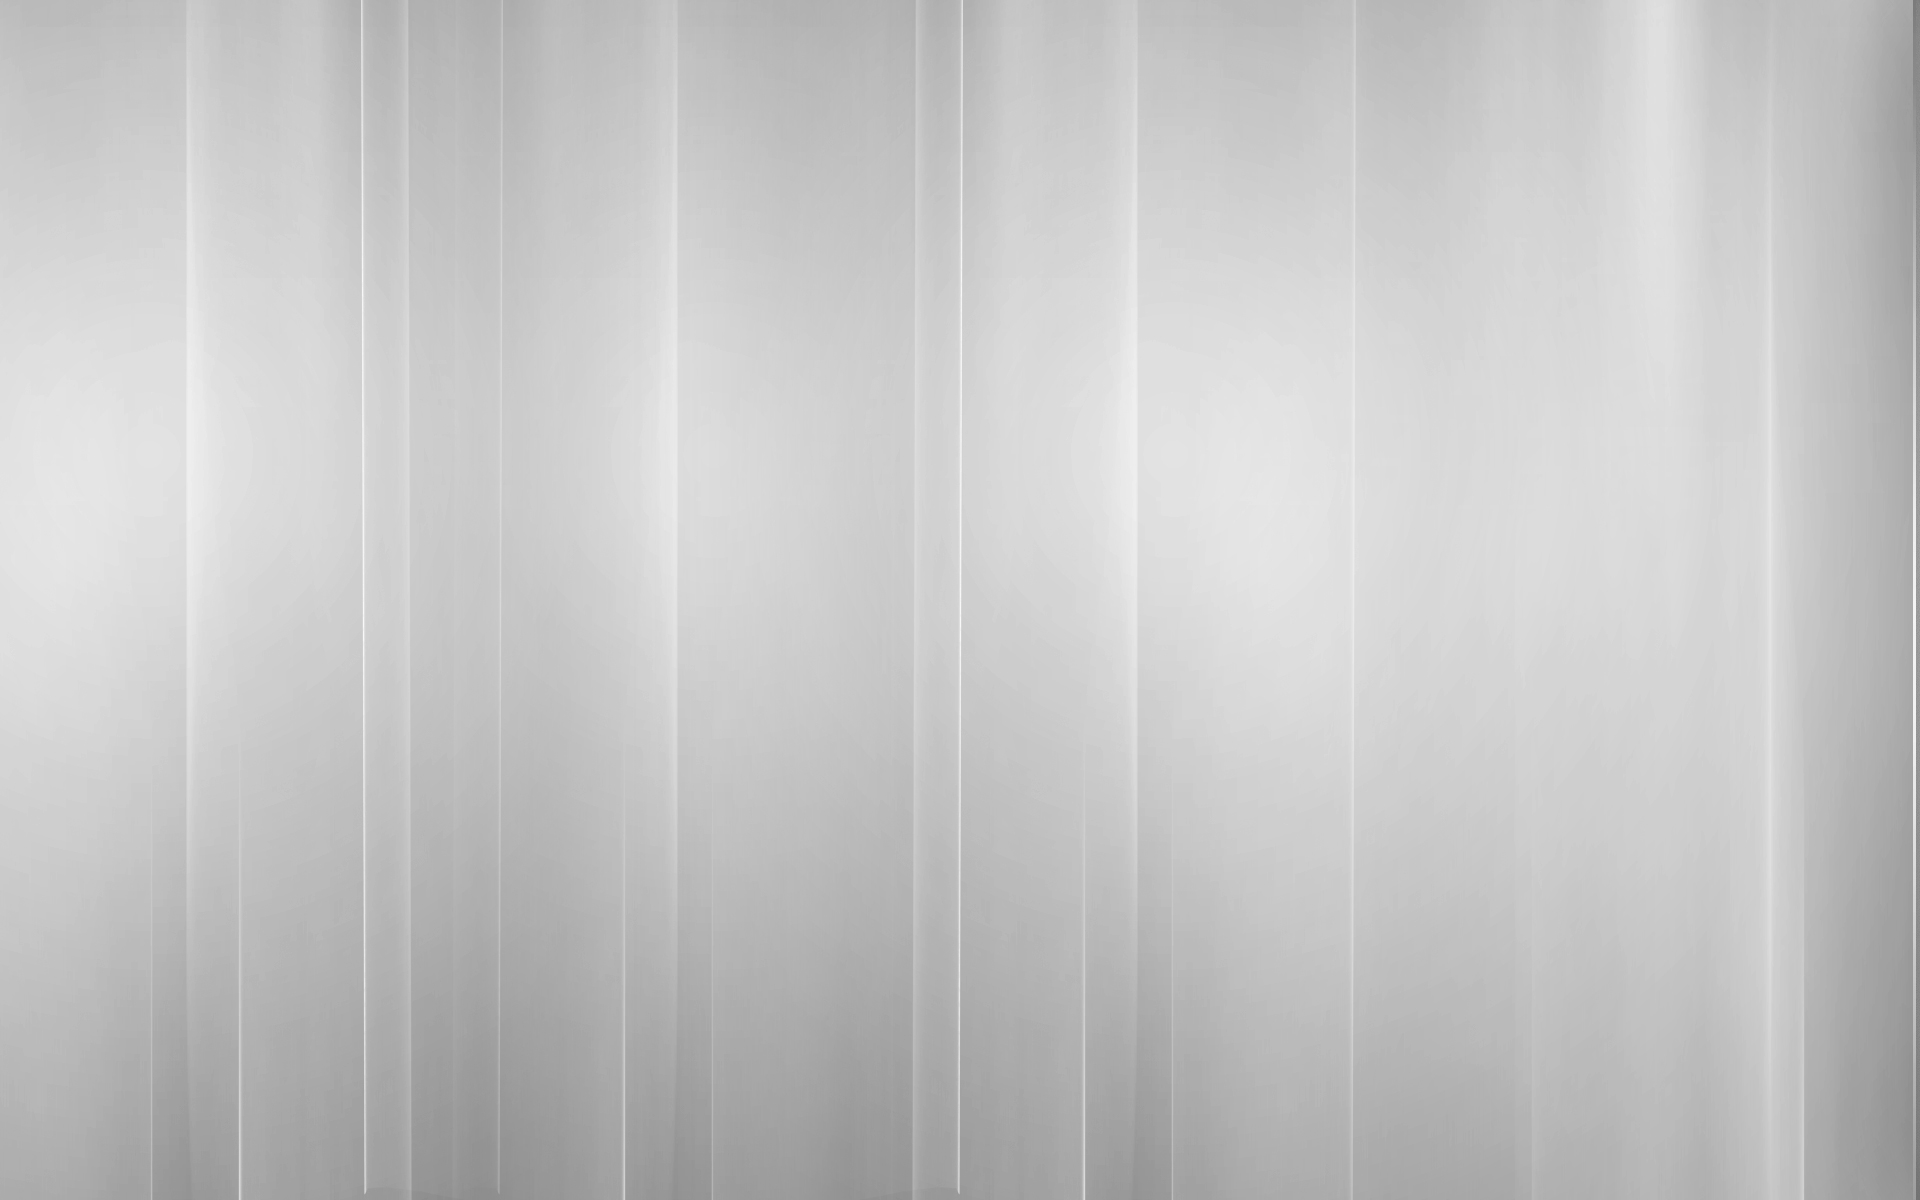 White wallpaper background wallpapersafari for Black and silver 3d wallpaper